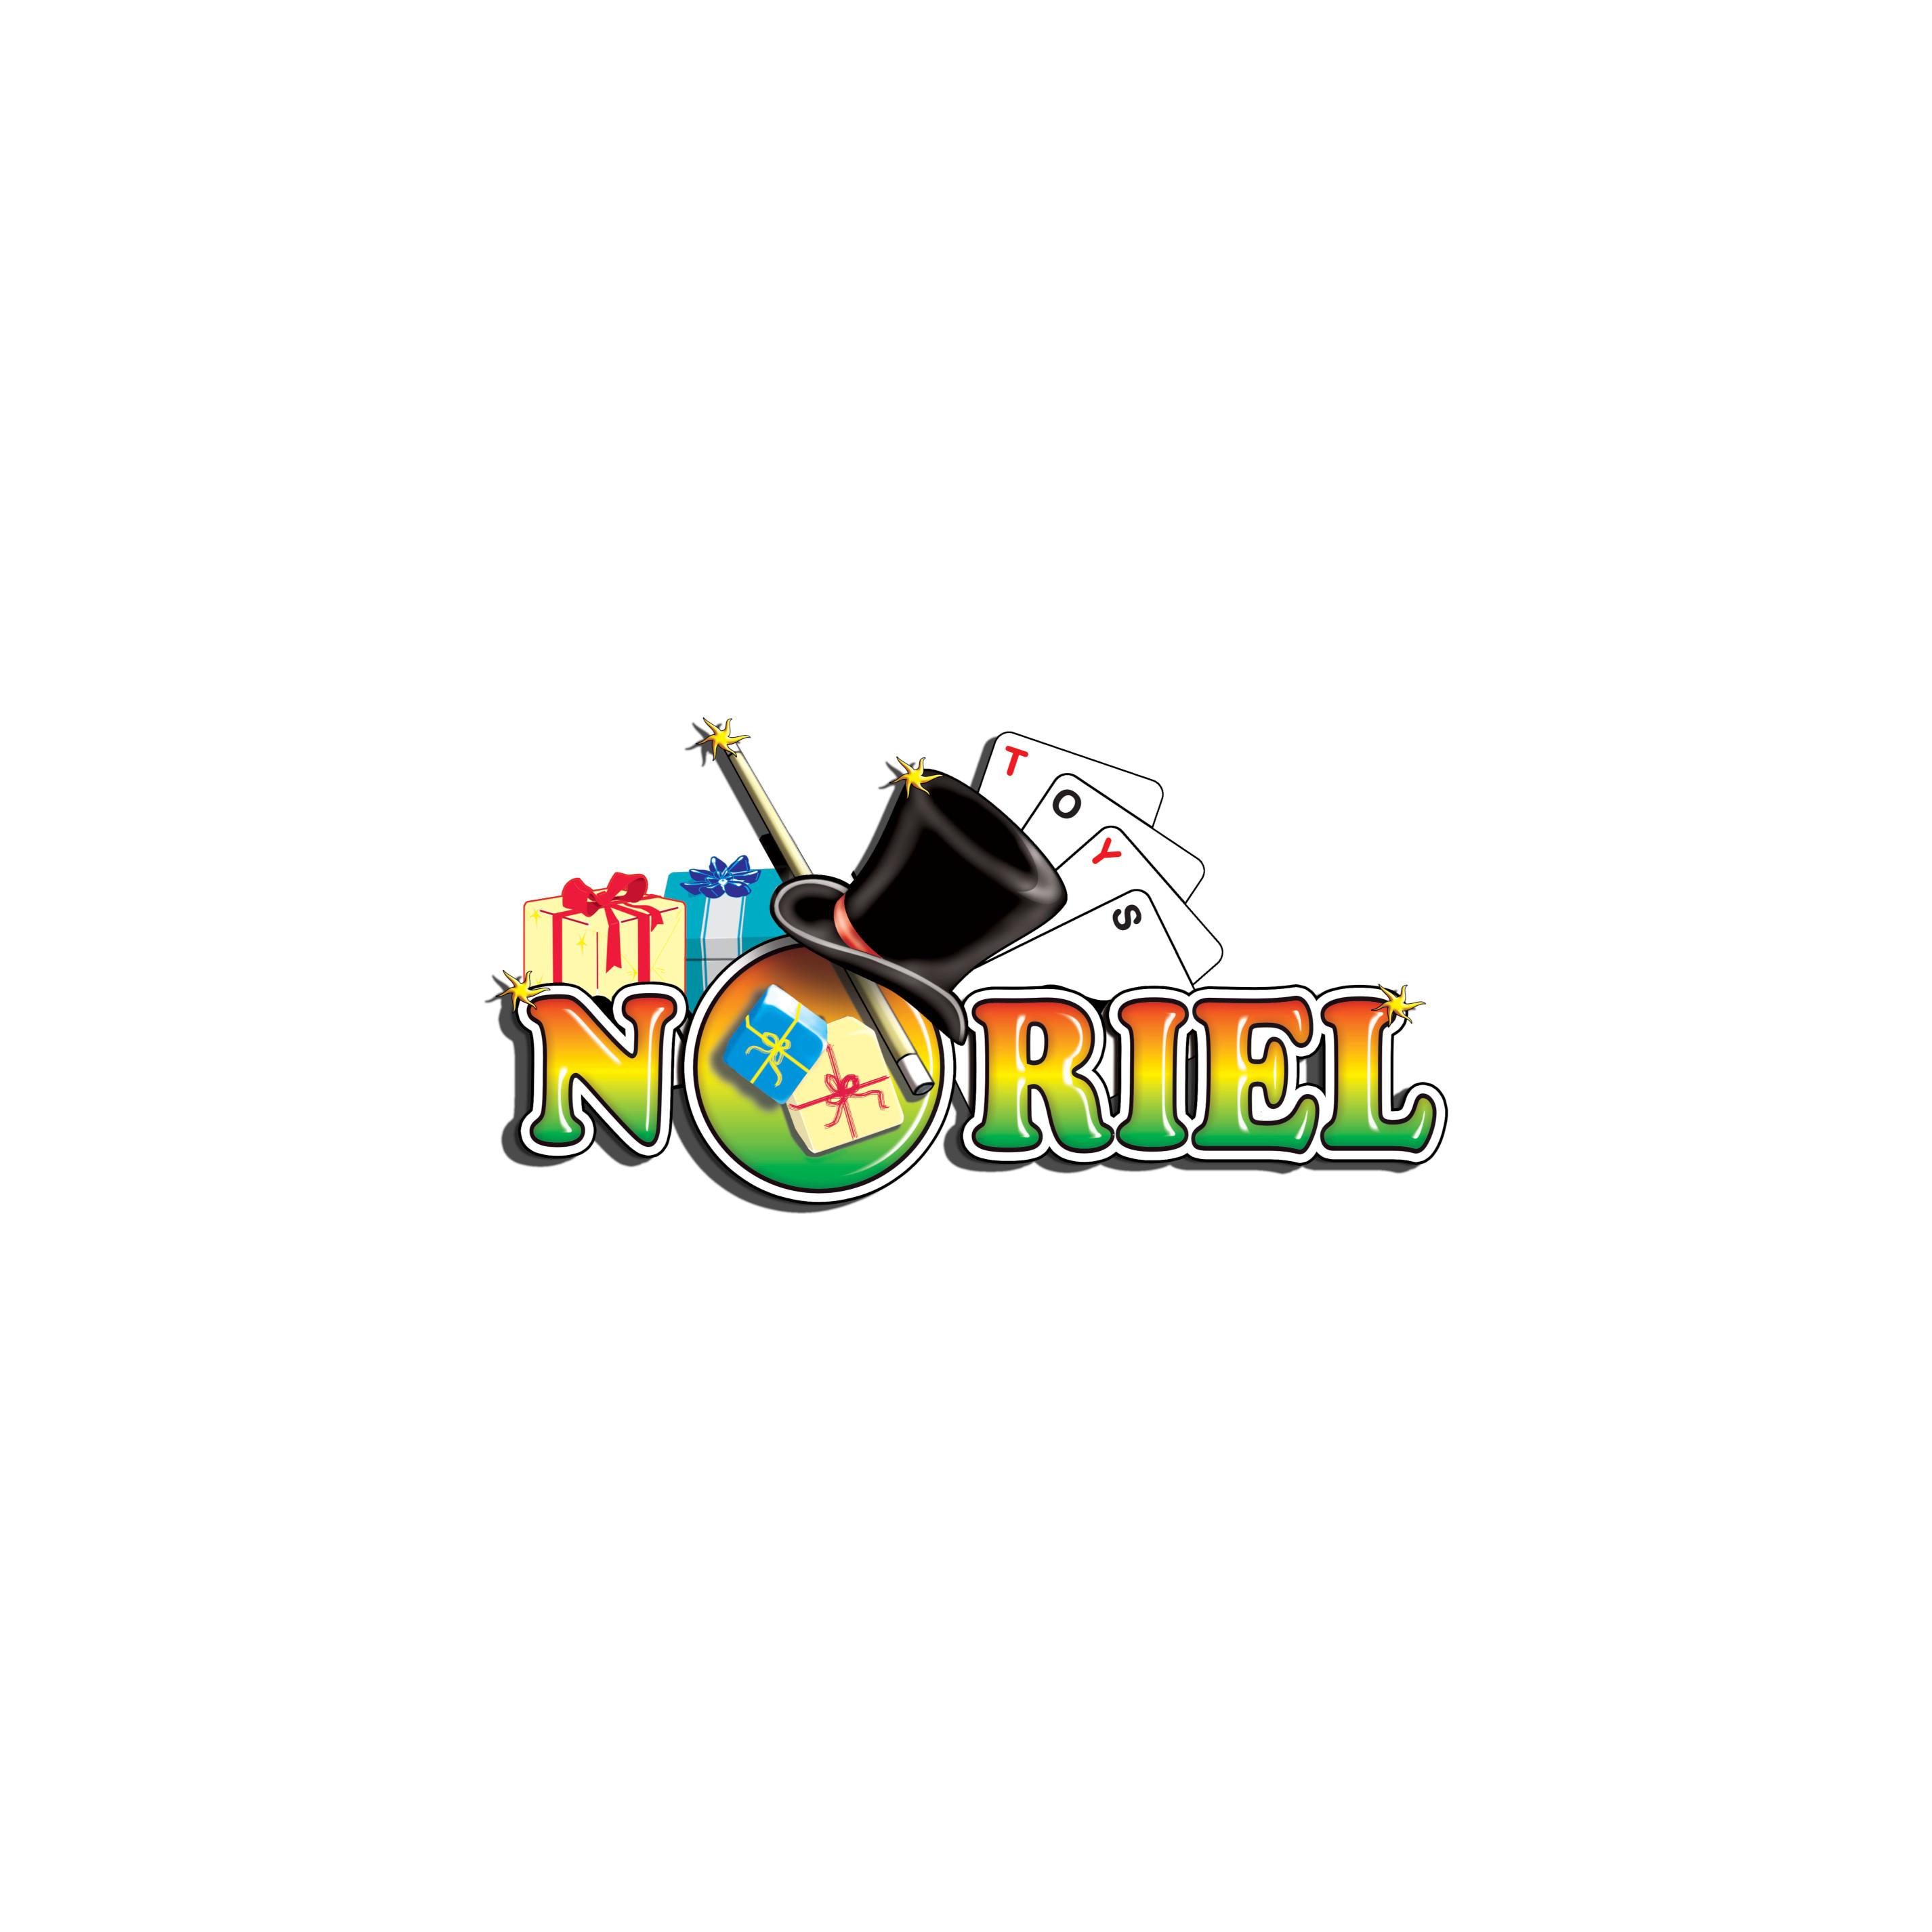 Tricou copii Joystar Colectia Candy 3I2229 | Noriel